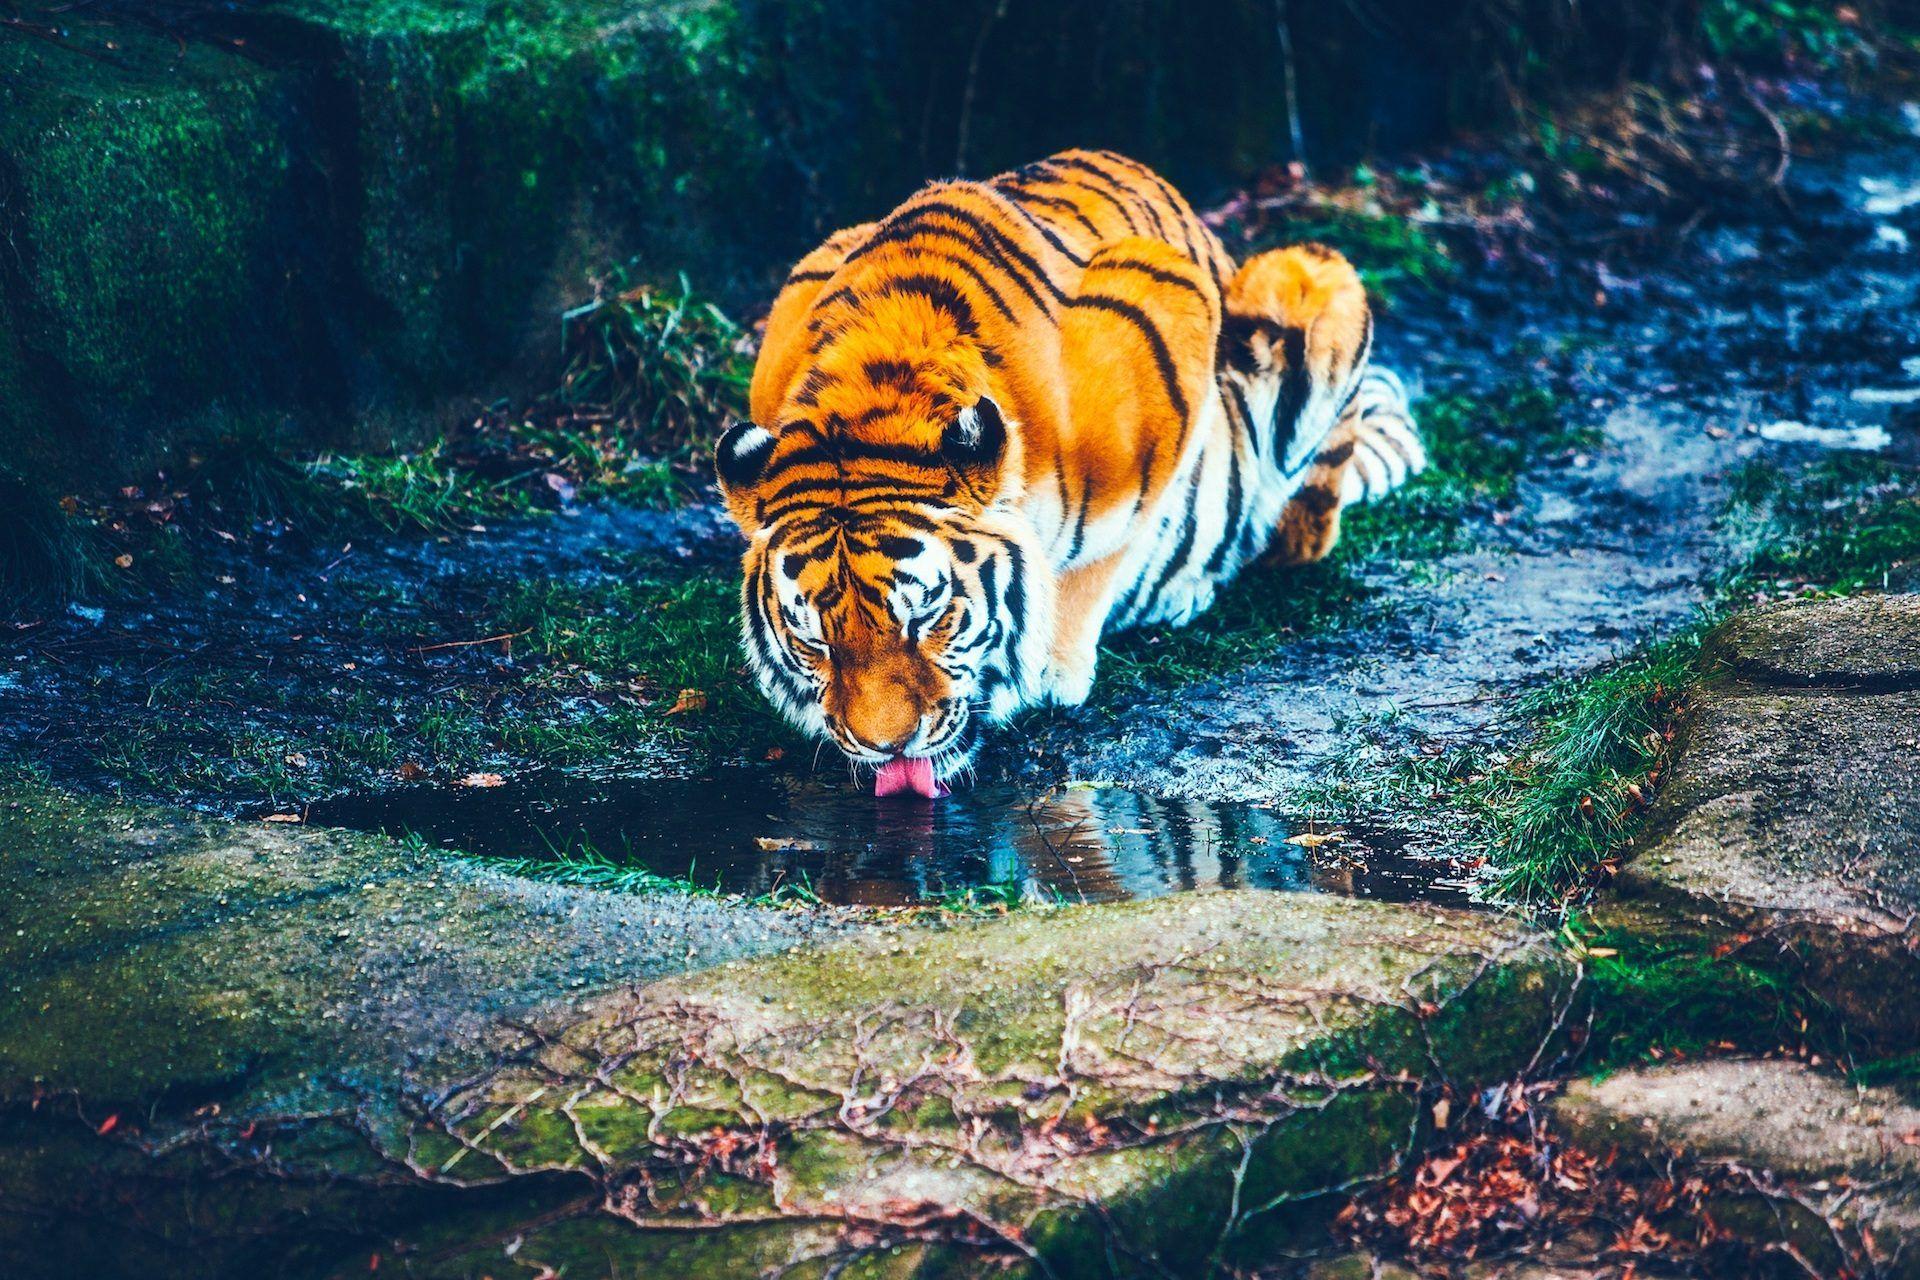 Fondos Animados Para Celular De Animales: Tigre, Salvaje, Depredador, Felino, Beber, Agua, Libertad